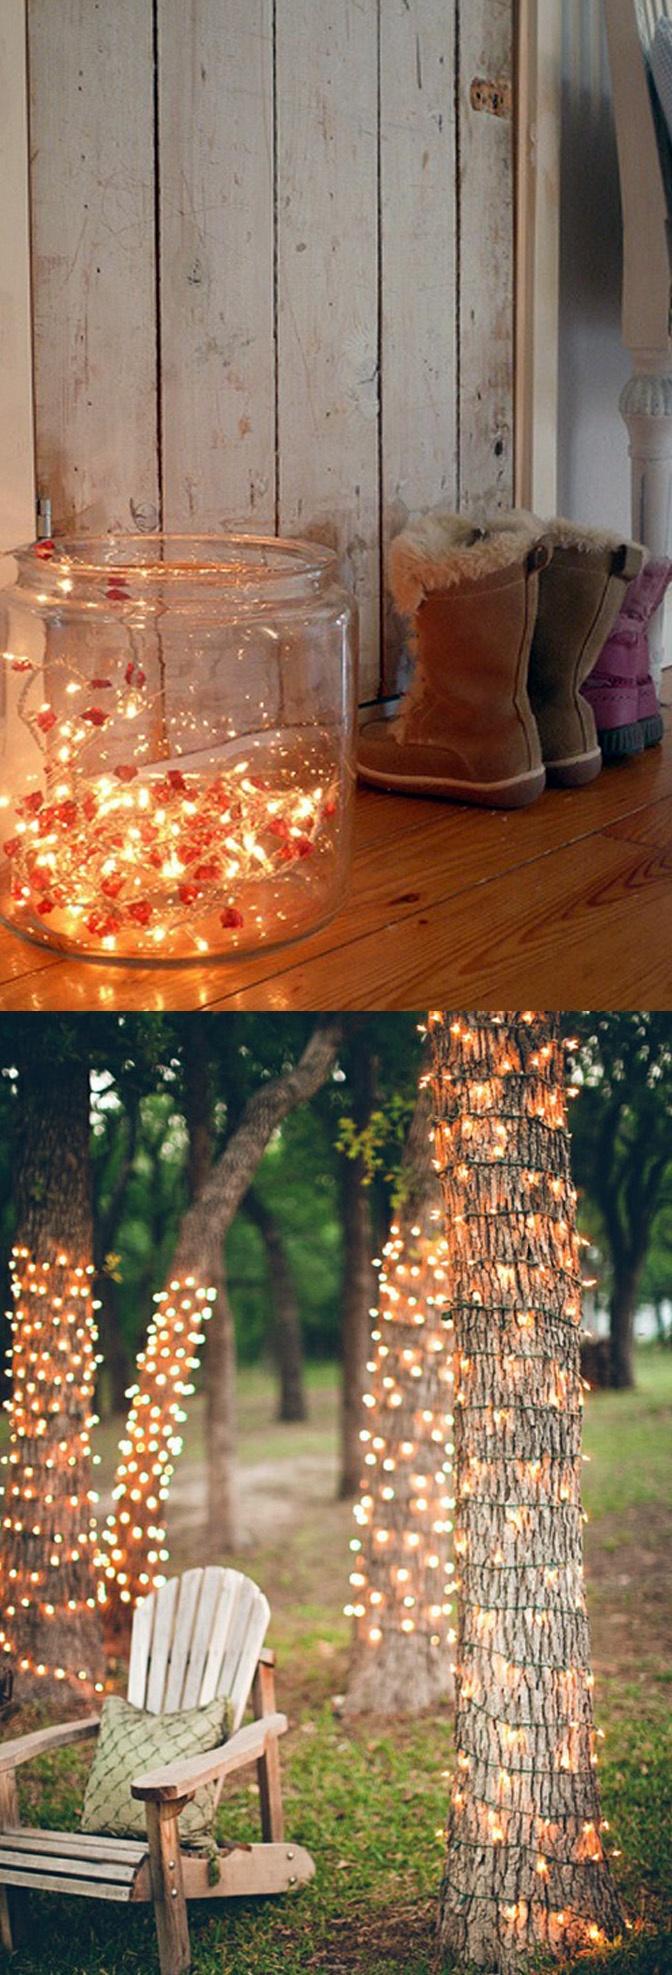 51 best lighting images on pinterest lights twinkle lights and